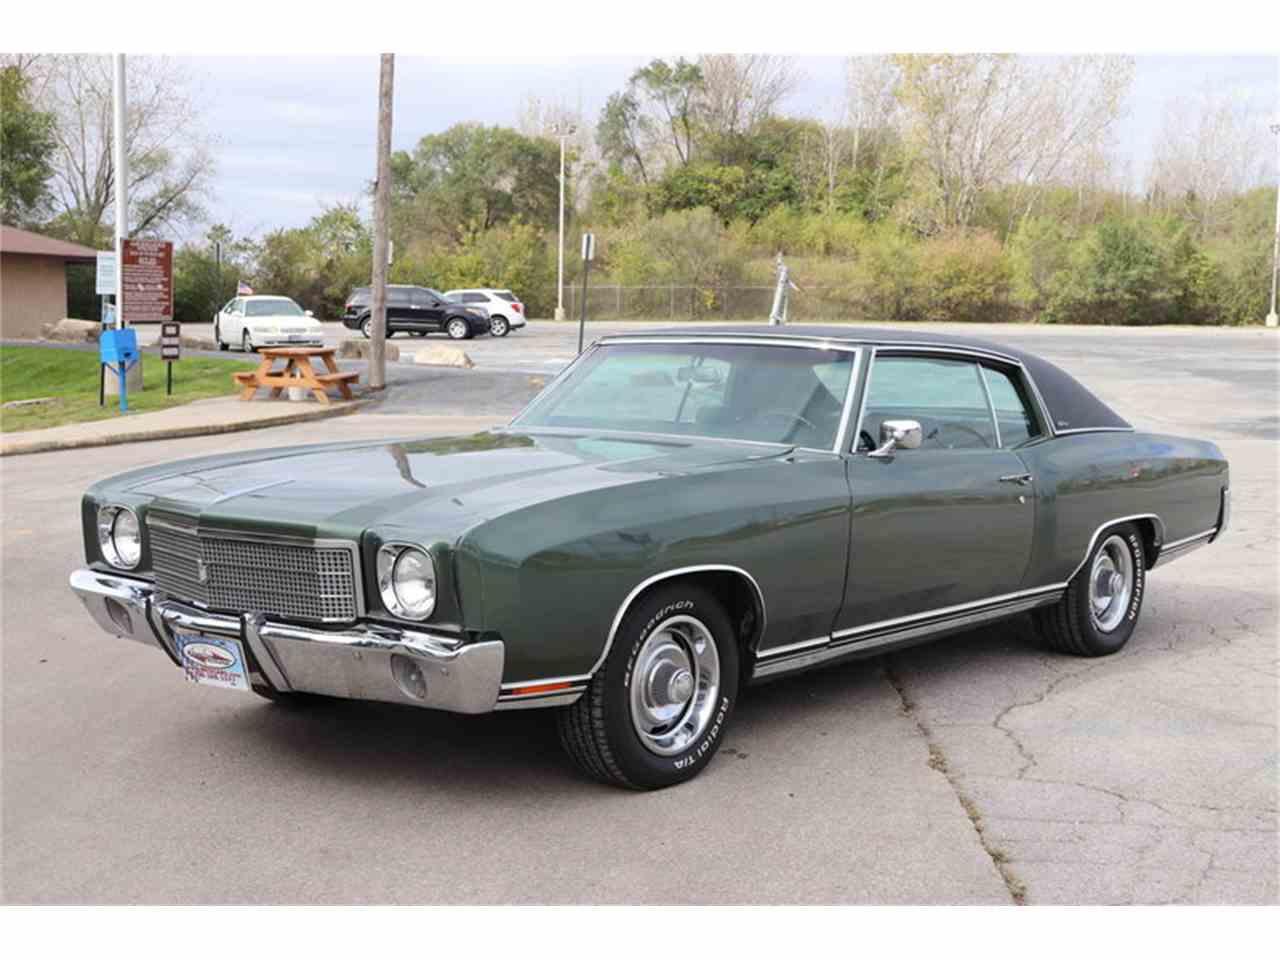 1970 Chevrolet Monte Carlo For Sale Classiccars Com Cc